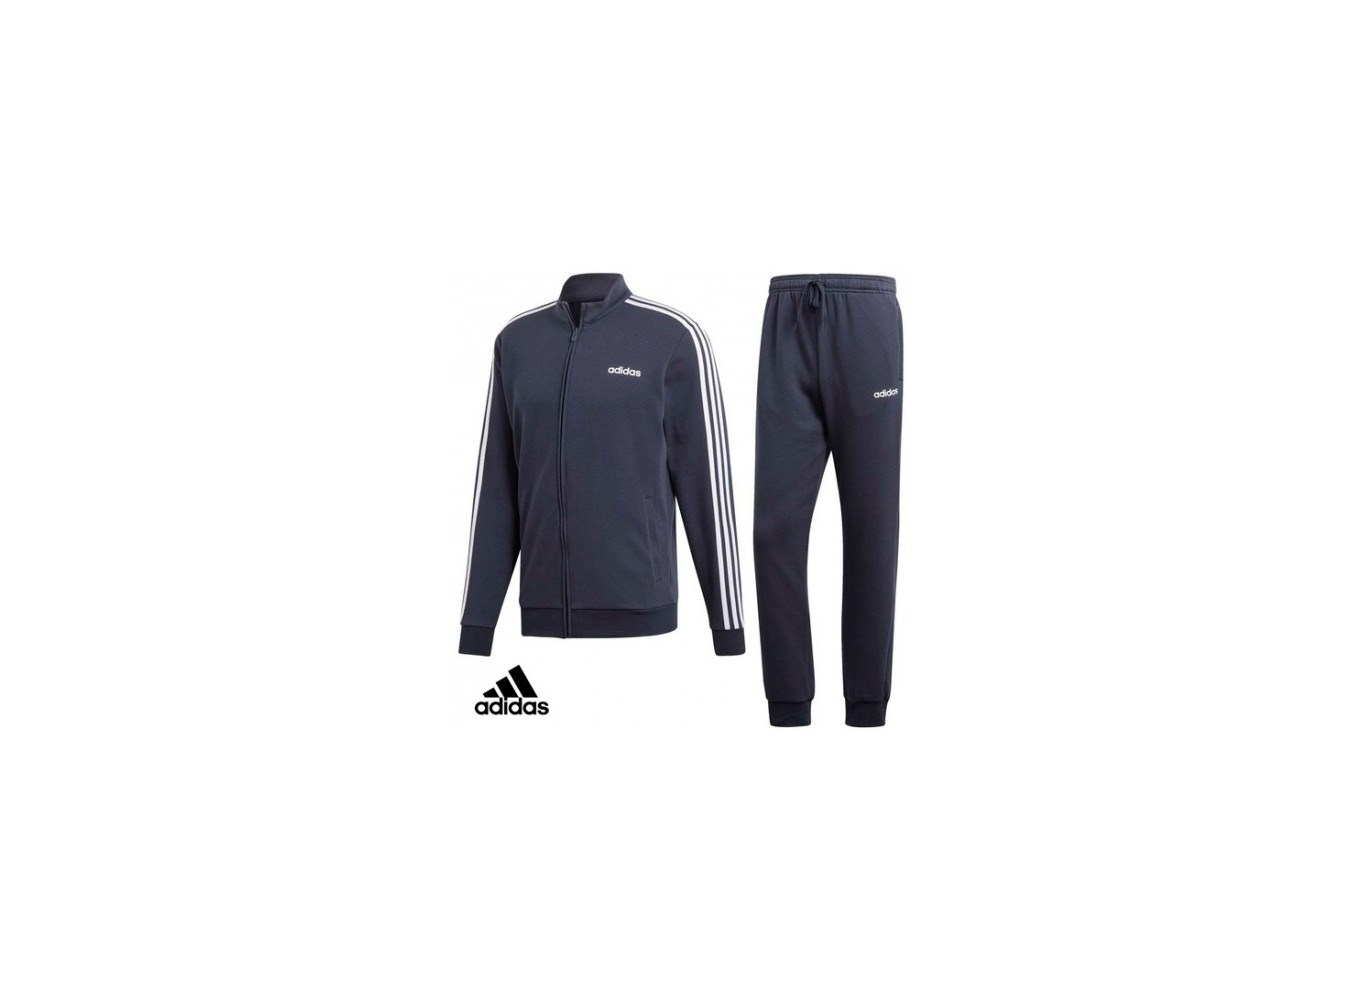 Adidas Chandal Hombre Clásico Para Chandal Chandal Clásico Para Clásico Hombre Hombre Adidas Para IbfgvY7m6y